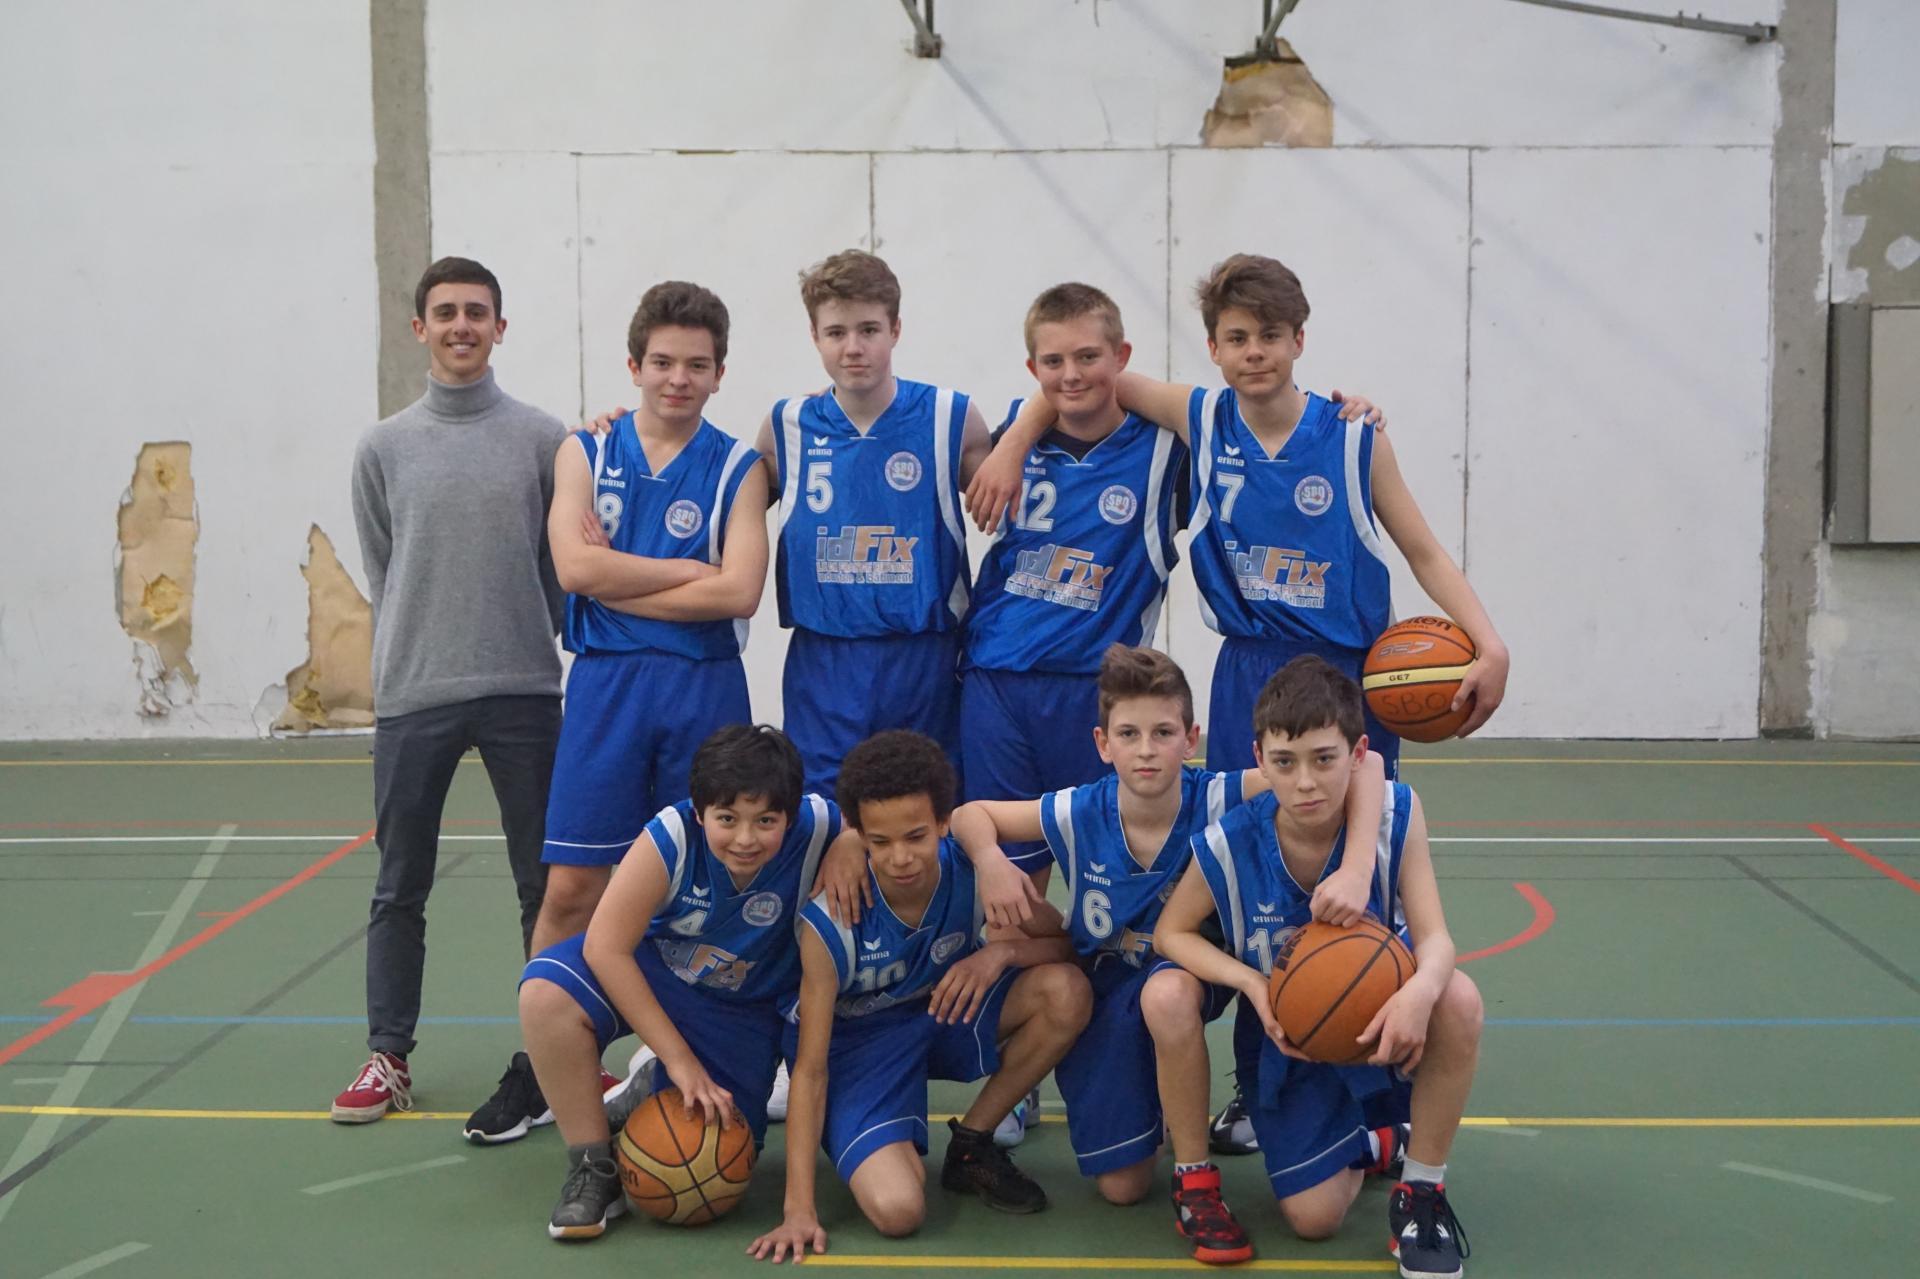 U15M Sud Basket Oise Saison 2018-2019